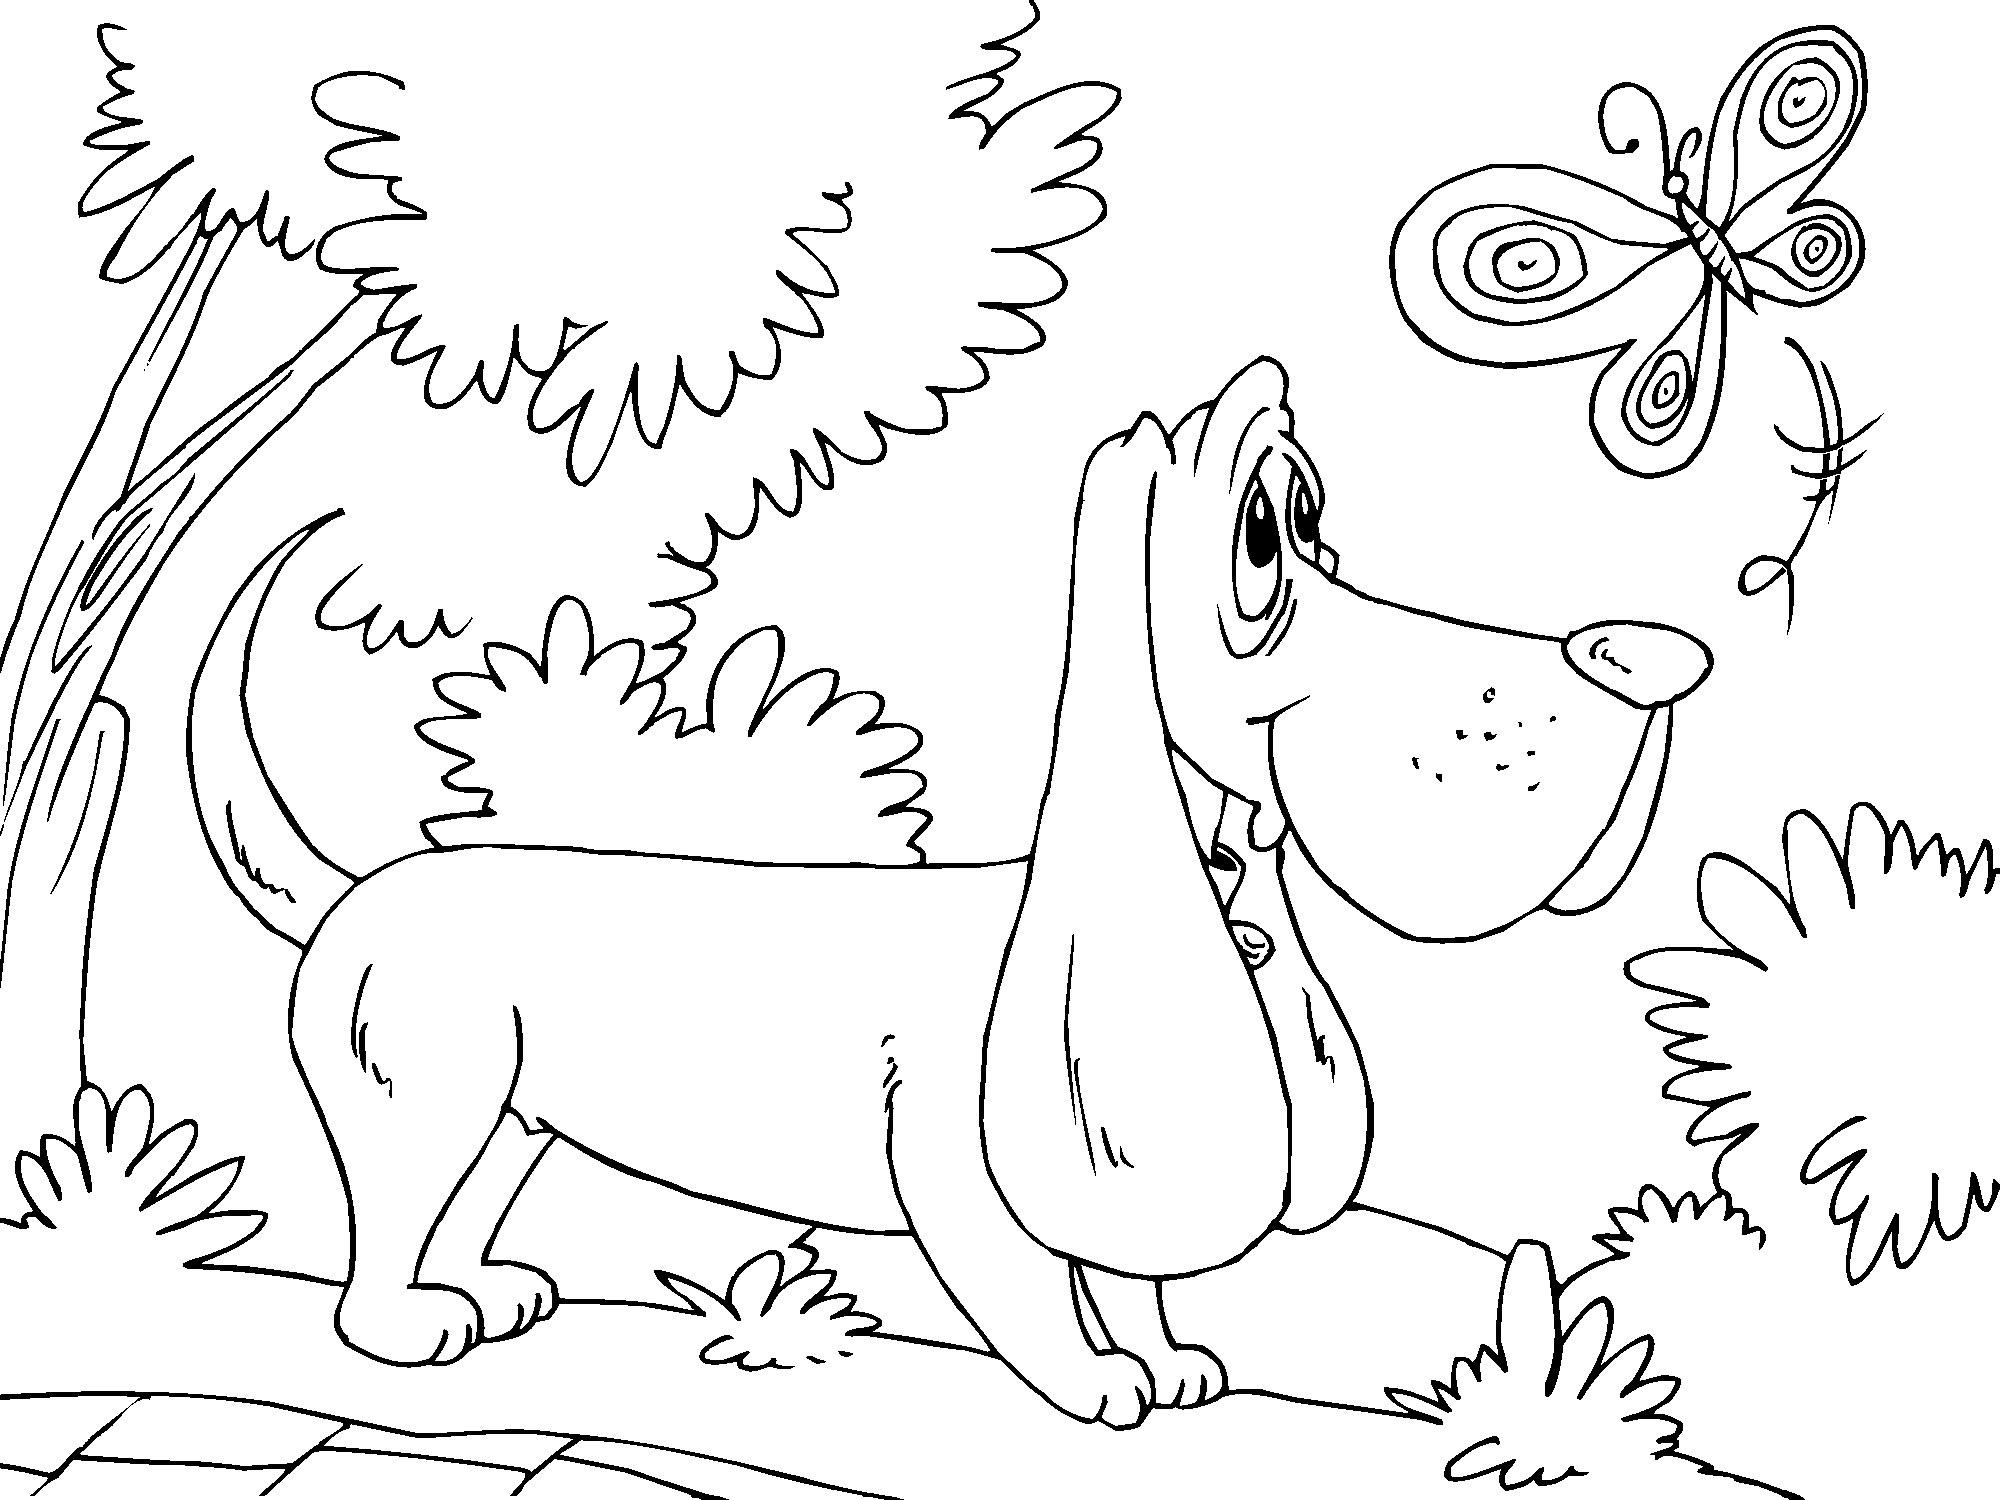 Dibujo para colorear perro de caza - Img 22678